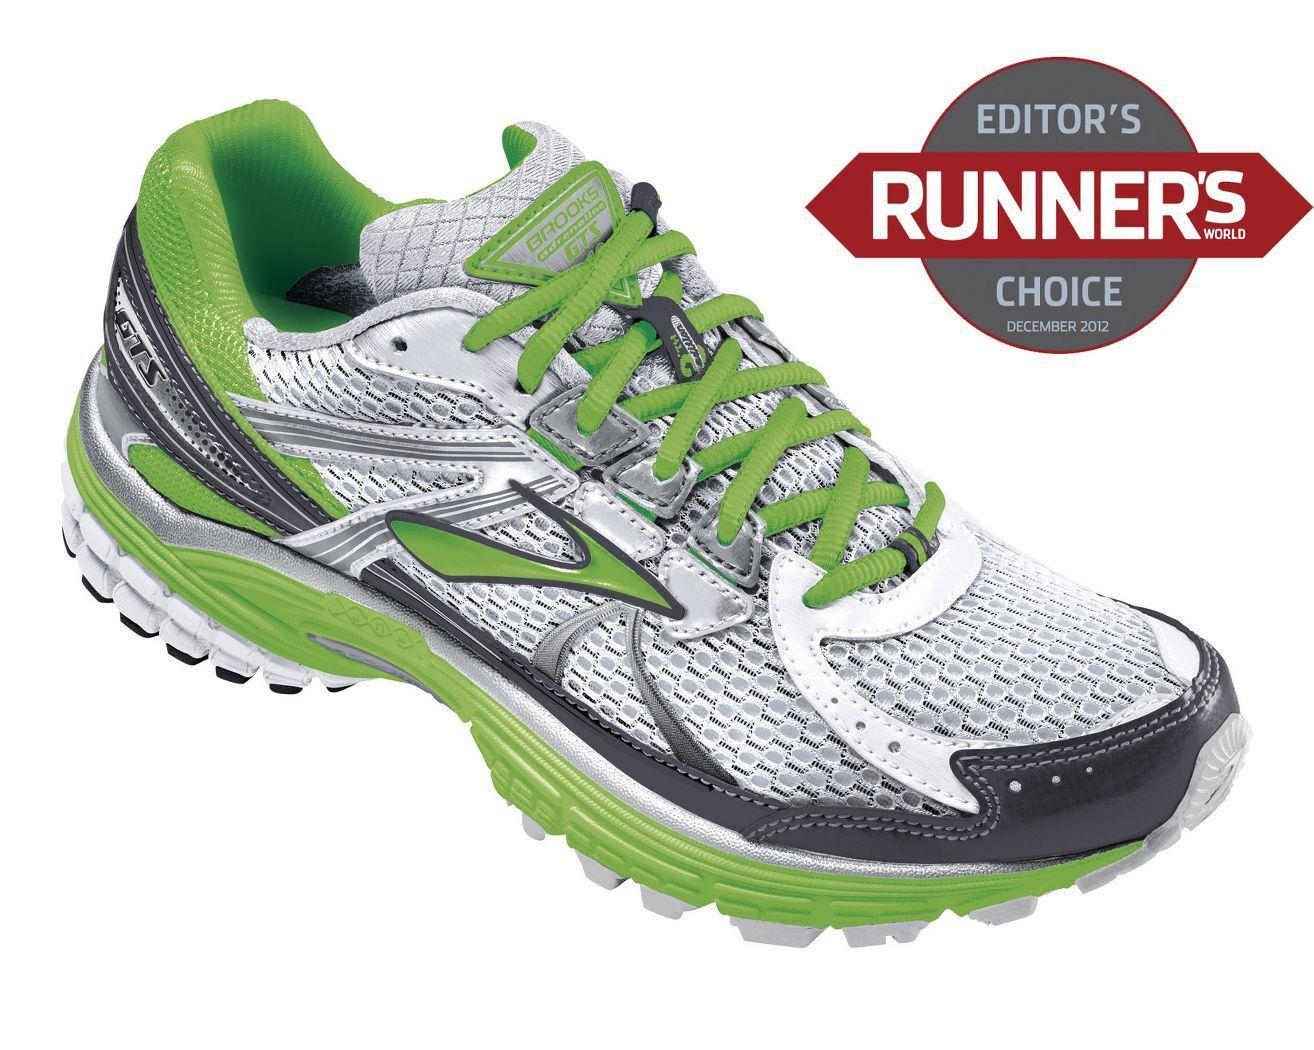 71139cd1452 Womens Brooks Adrenaline GTS 13 Running Shoe at Road Runner Sports ...